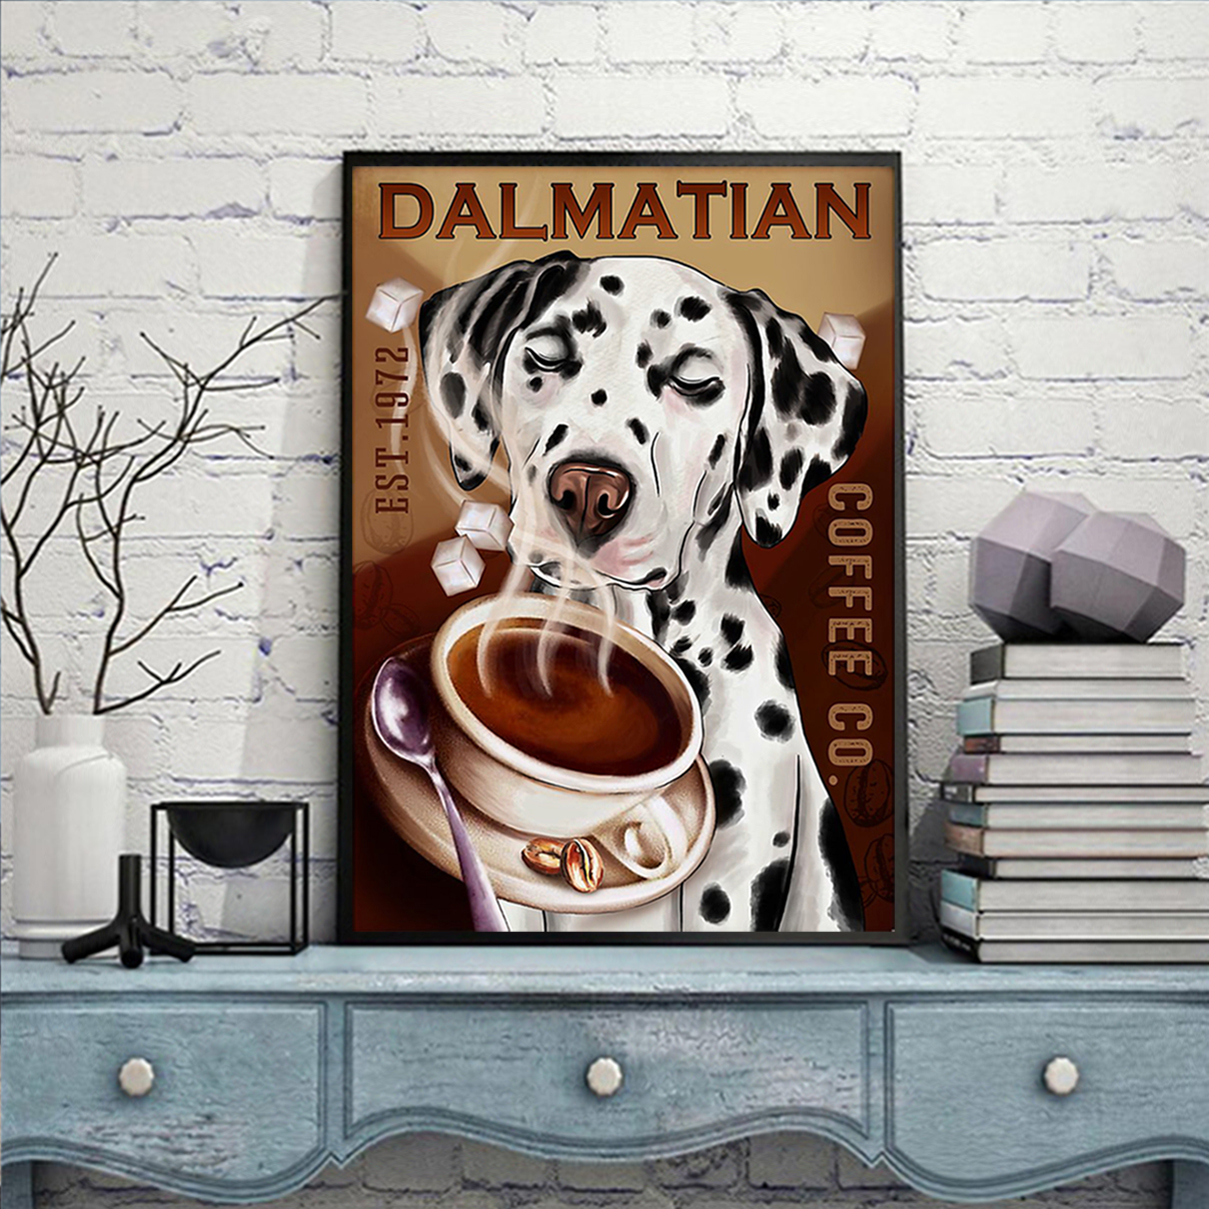 Dalmatian coffee poster A2